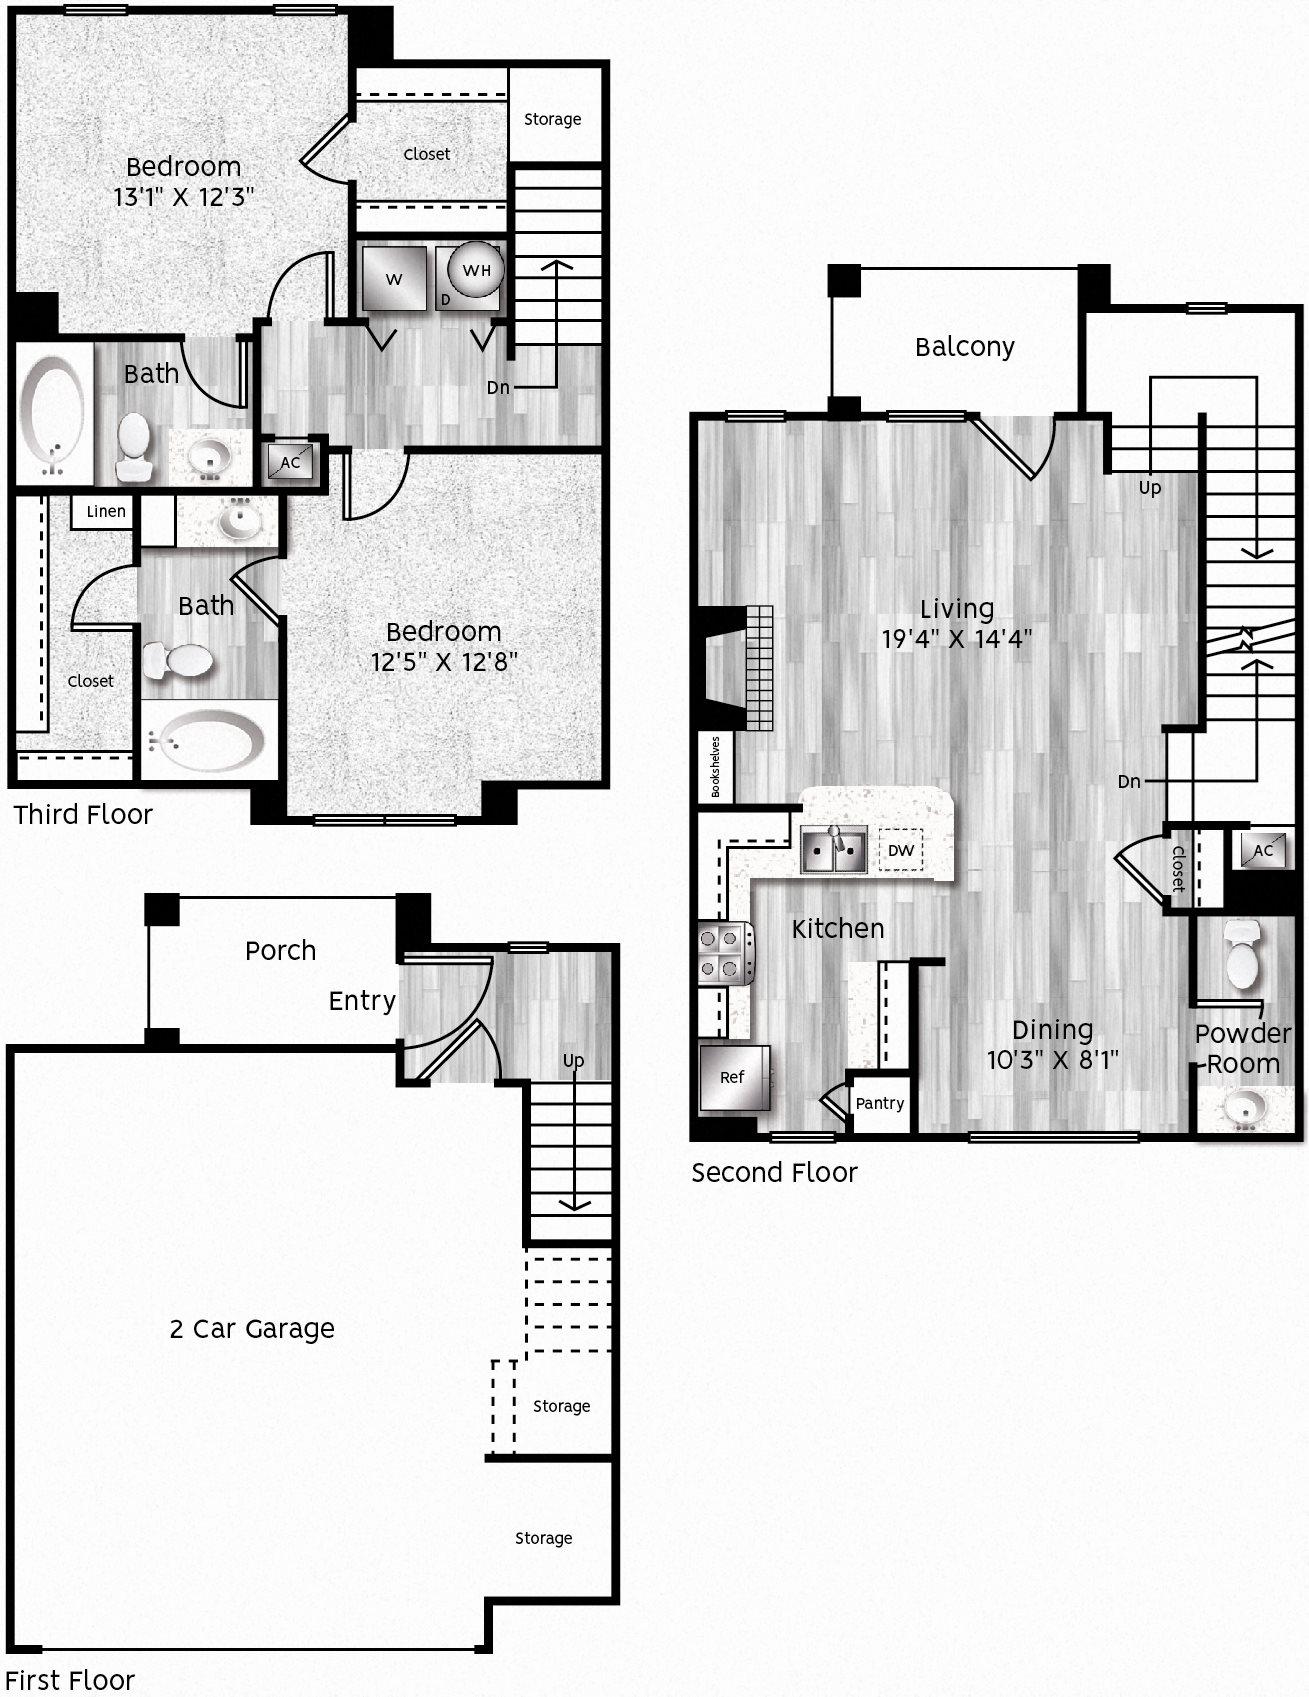 B4-LL 2 GARAGE Floor Plan 29